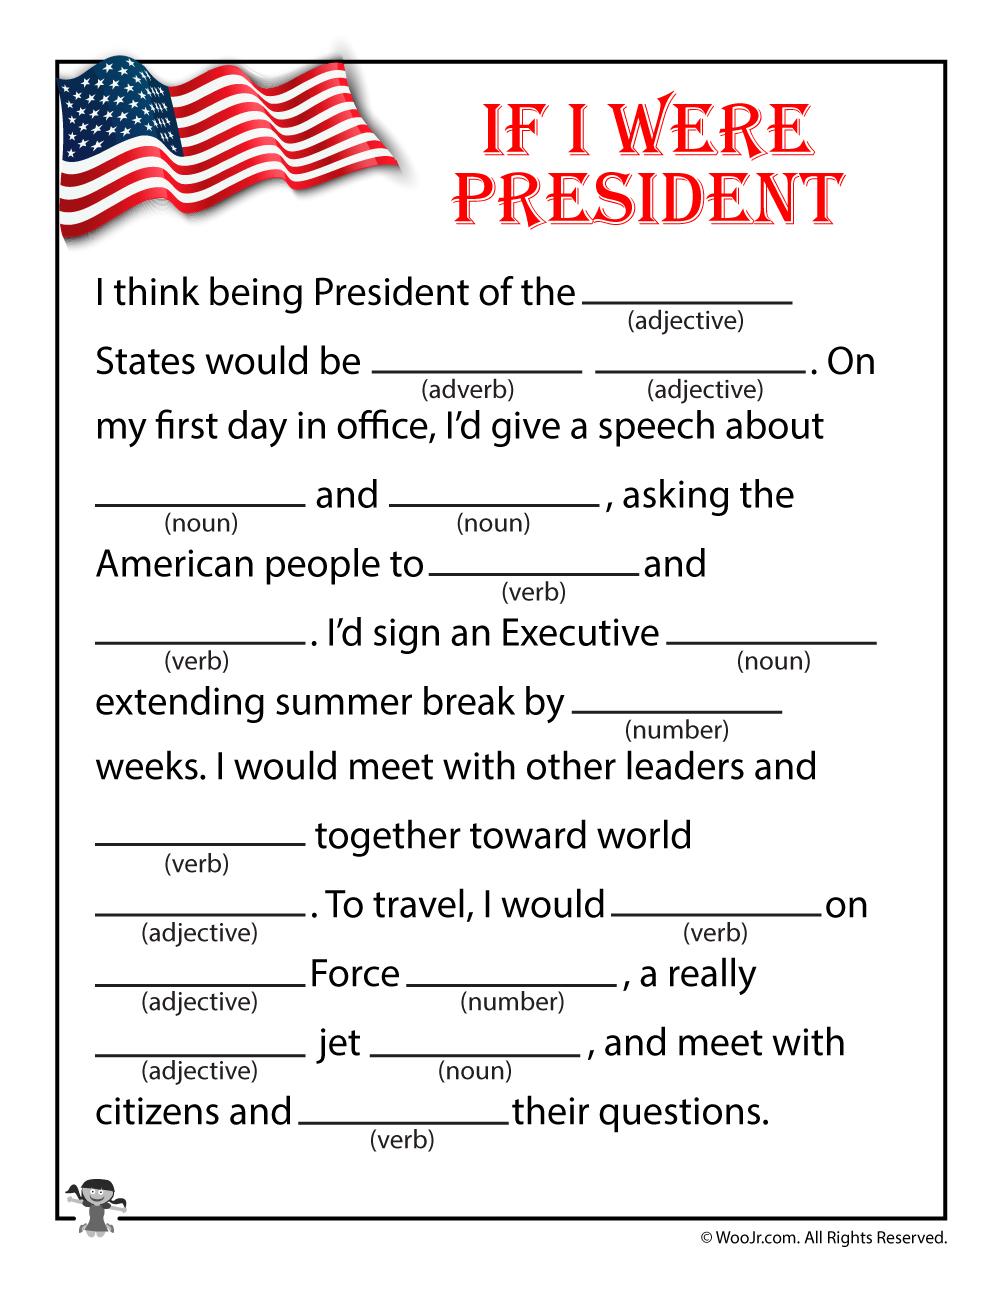 If I Were President Mad Lib For Kids   Woo! Jr. Kids Activities   If I Were President Printable Worksheet